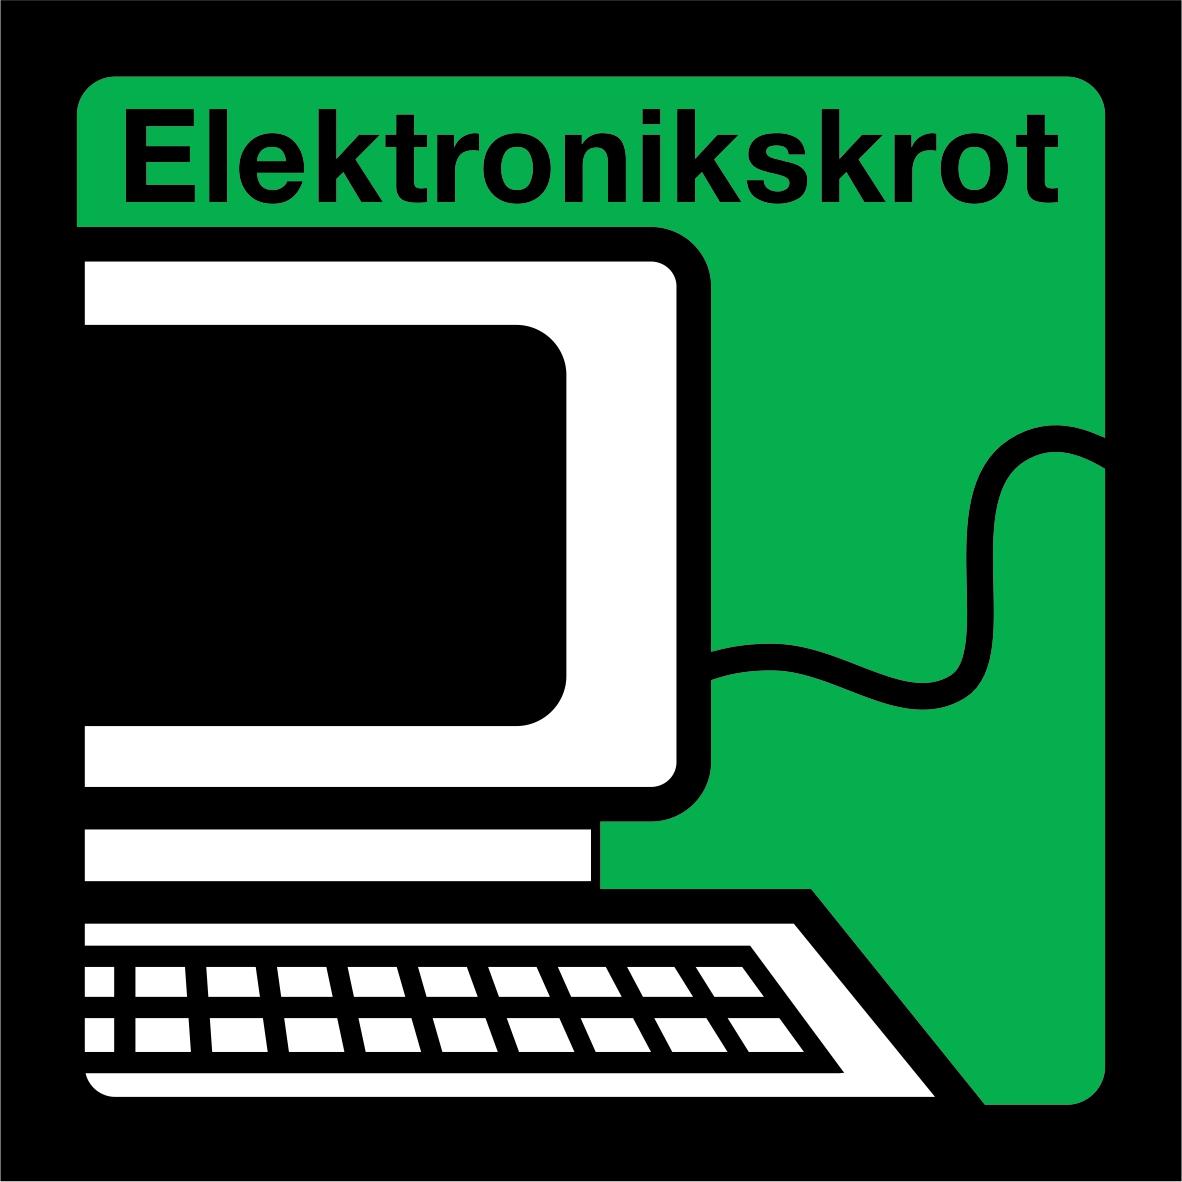 Elektronikskrot